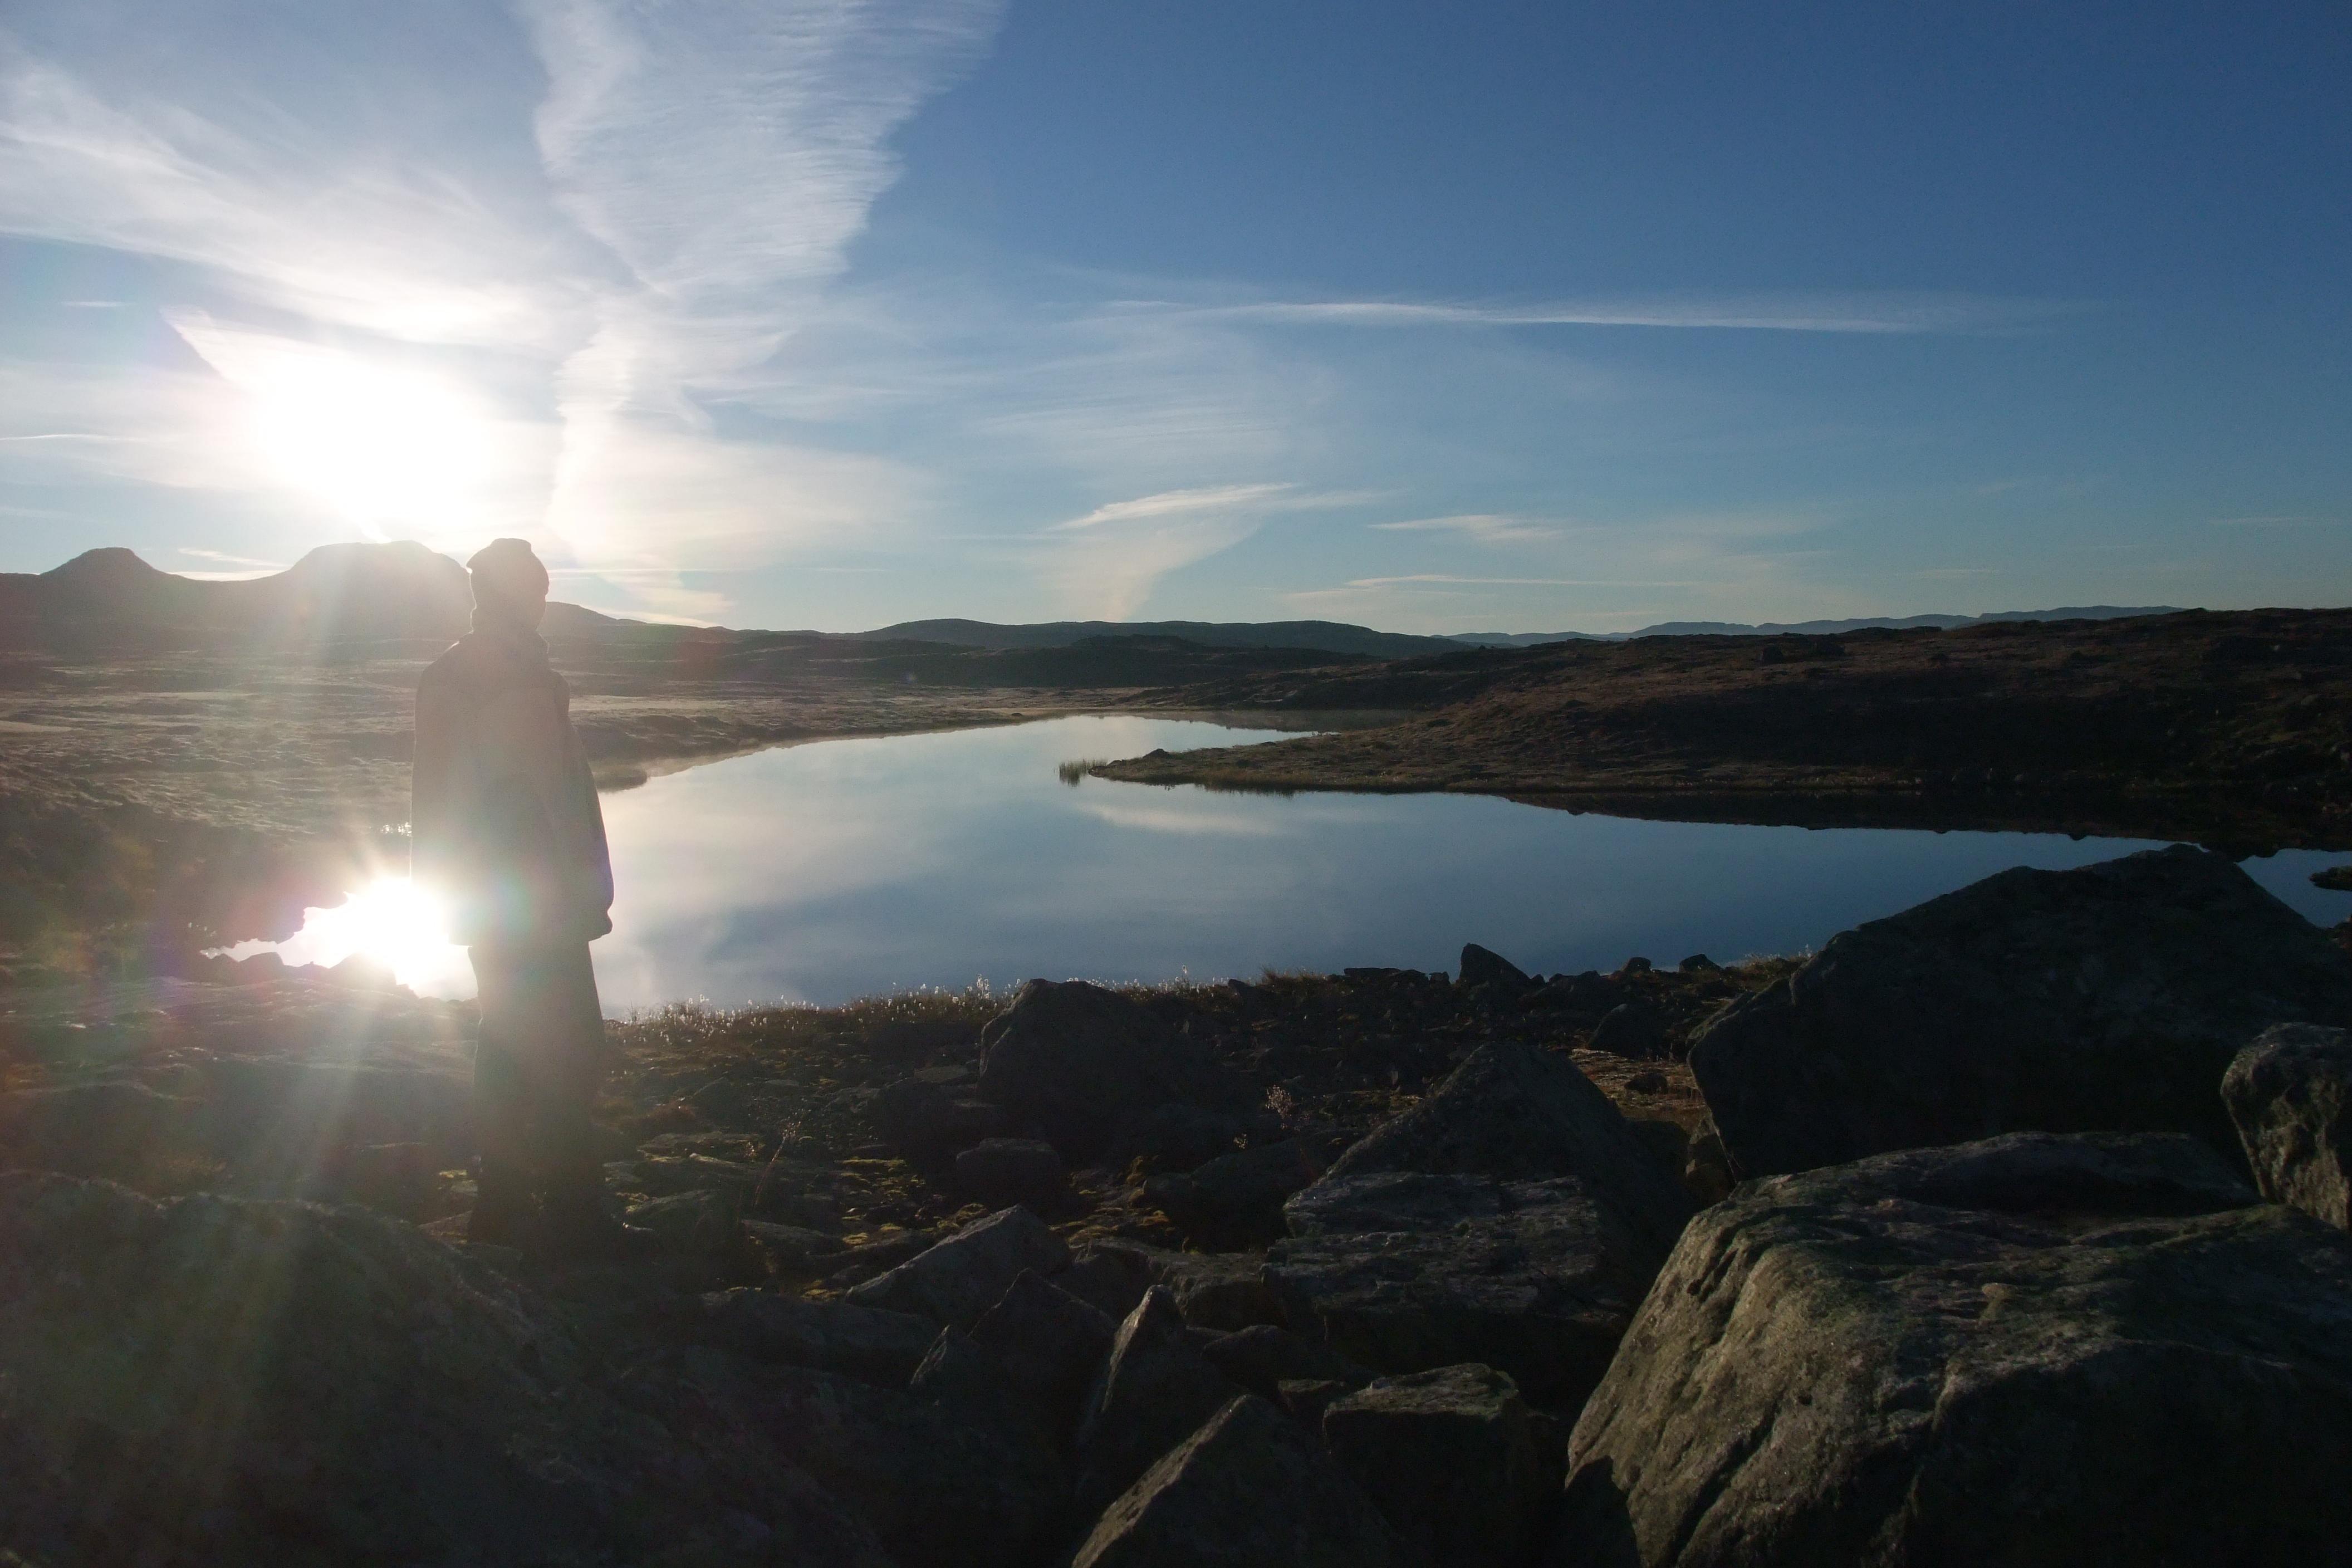 Morgen, Fjell, Hardangervidda, Zueignung